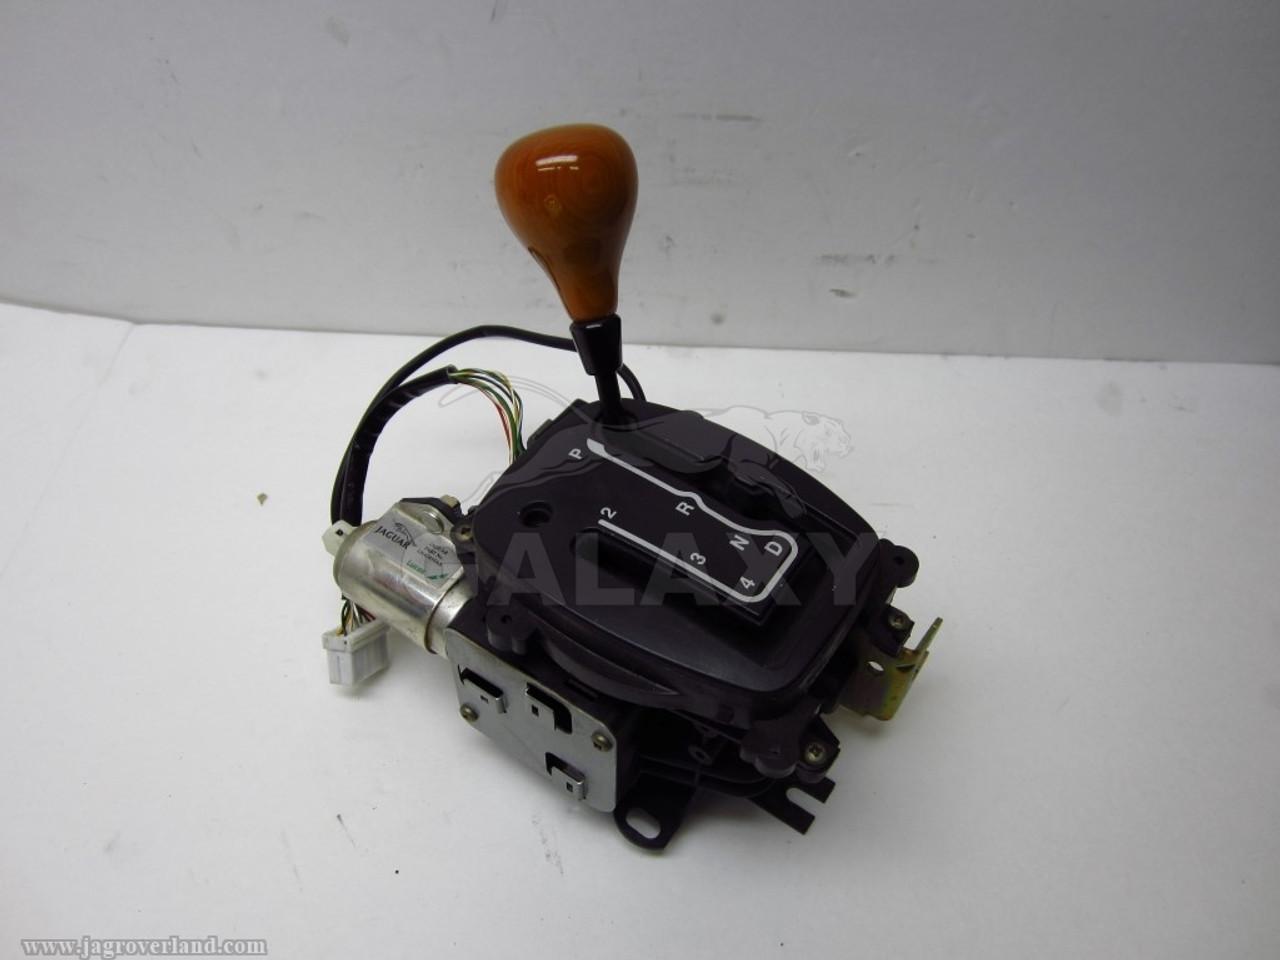 01-06 Xk8 Floor Shifter Gear Selector Indicator Module Mja4913